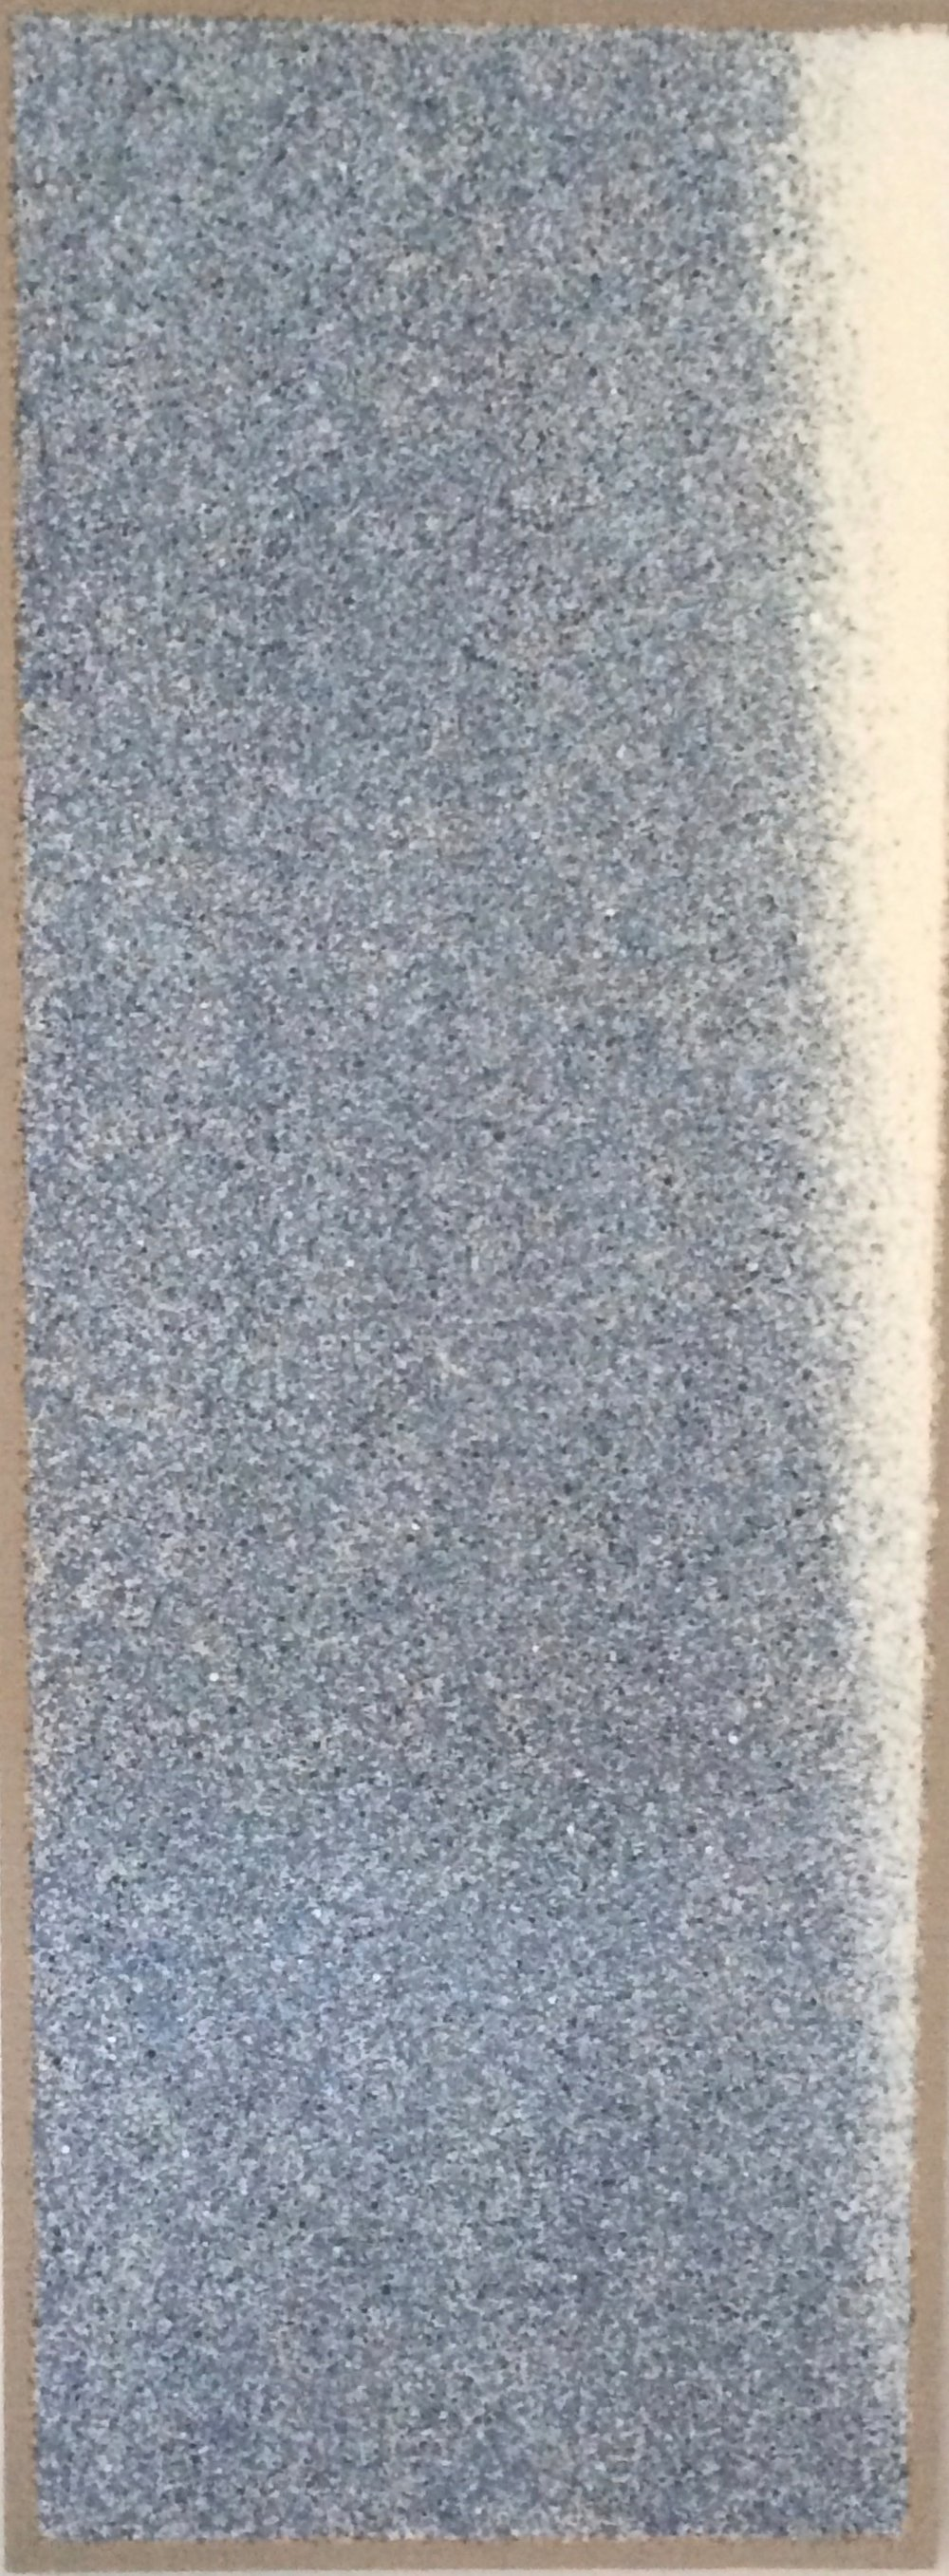 """Avalokitesvara"" 80 x 30 inches, 2014"